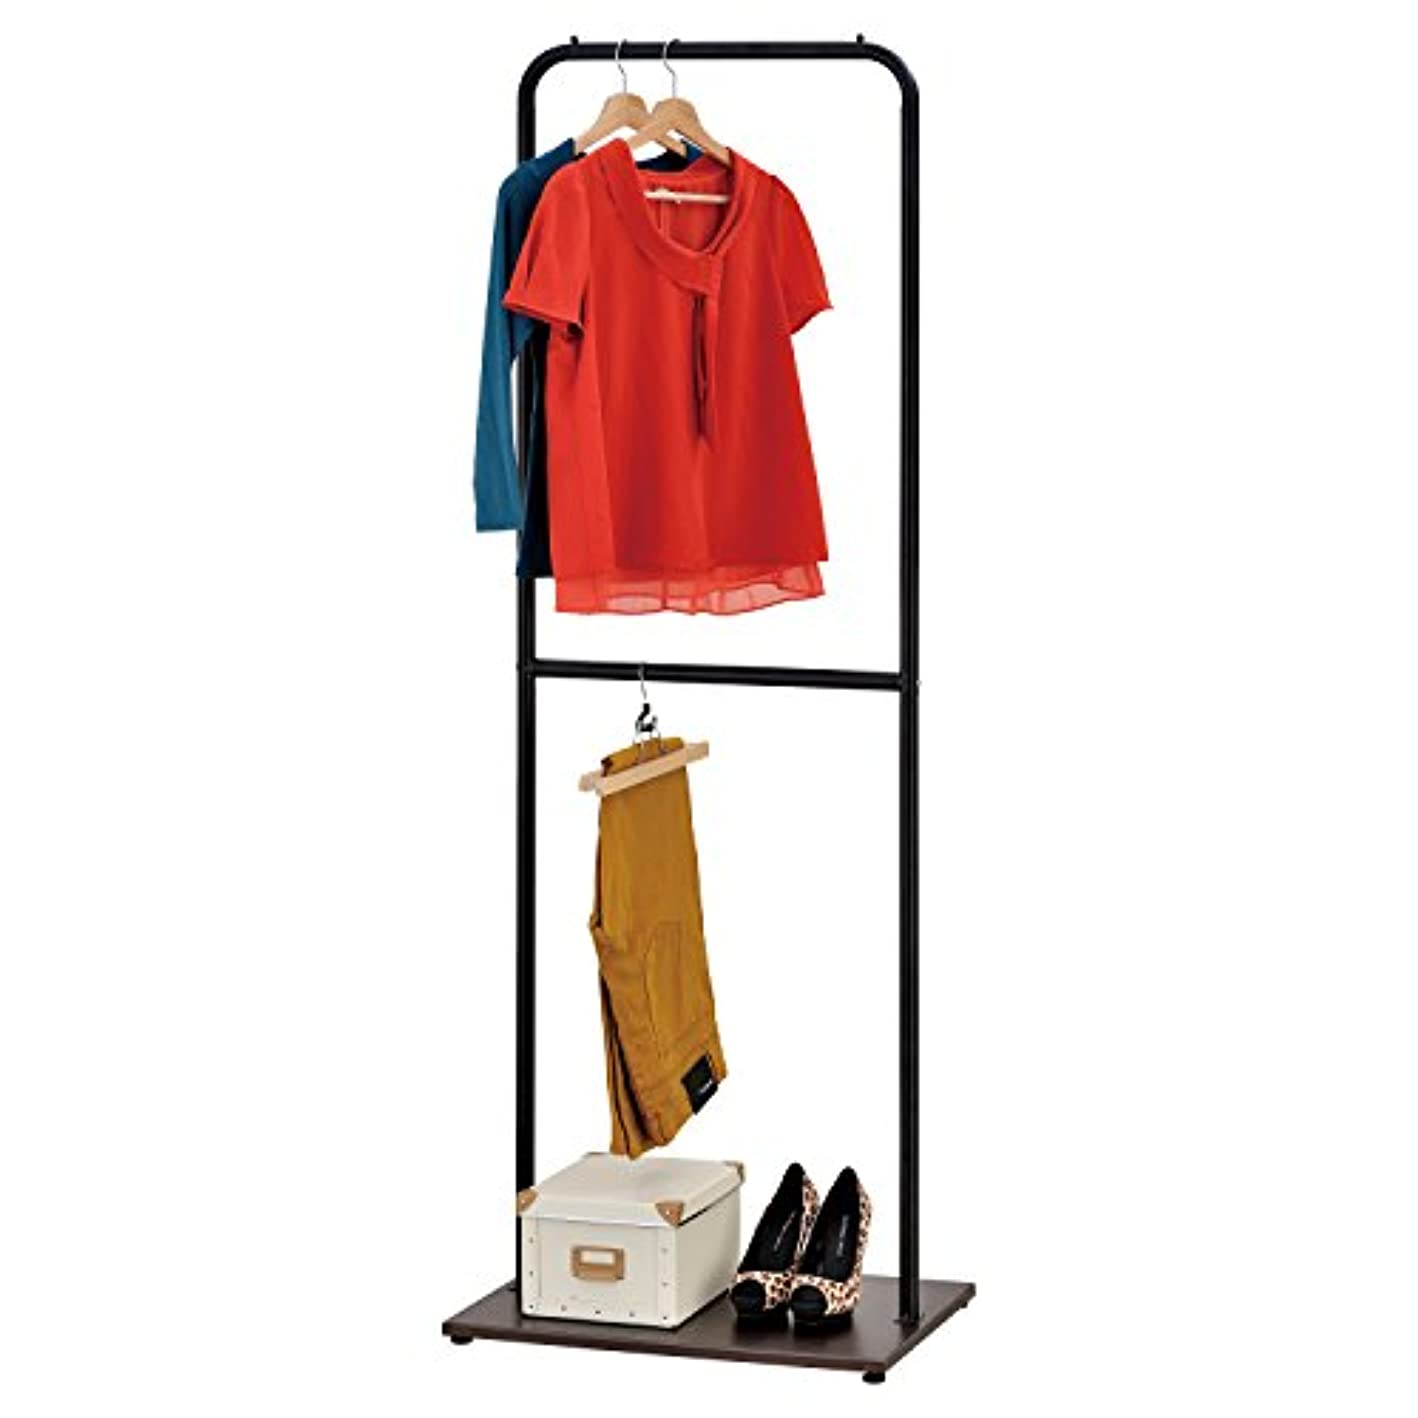 Adjustable Height Single Bar Garment Rack, Metal Pipe Design Clothes Hanger with Wood Base